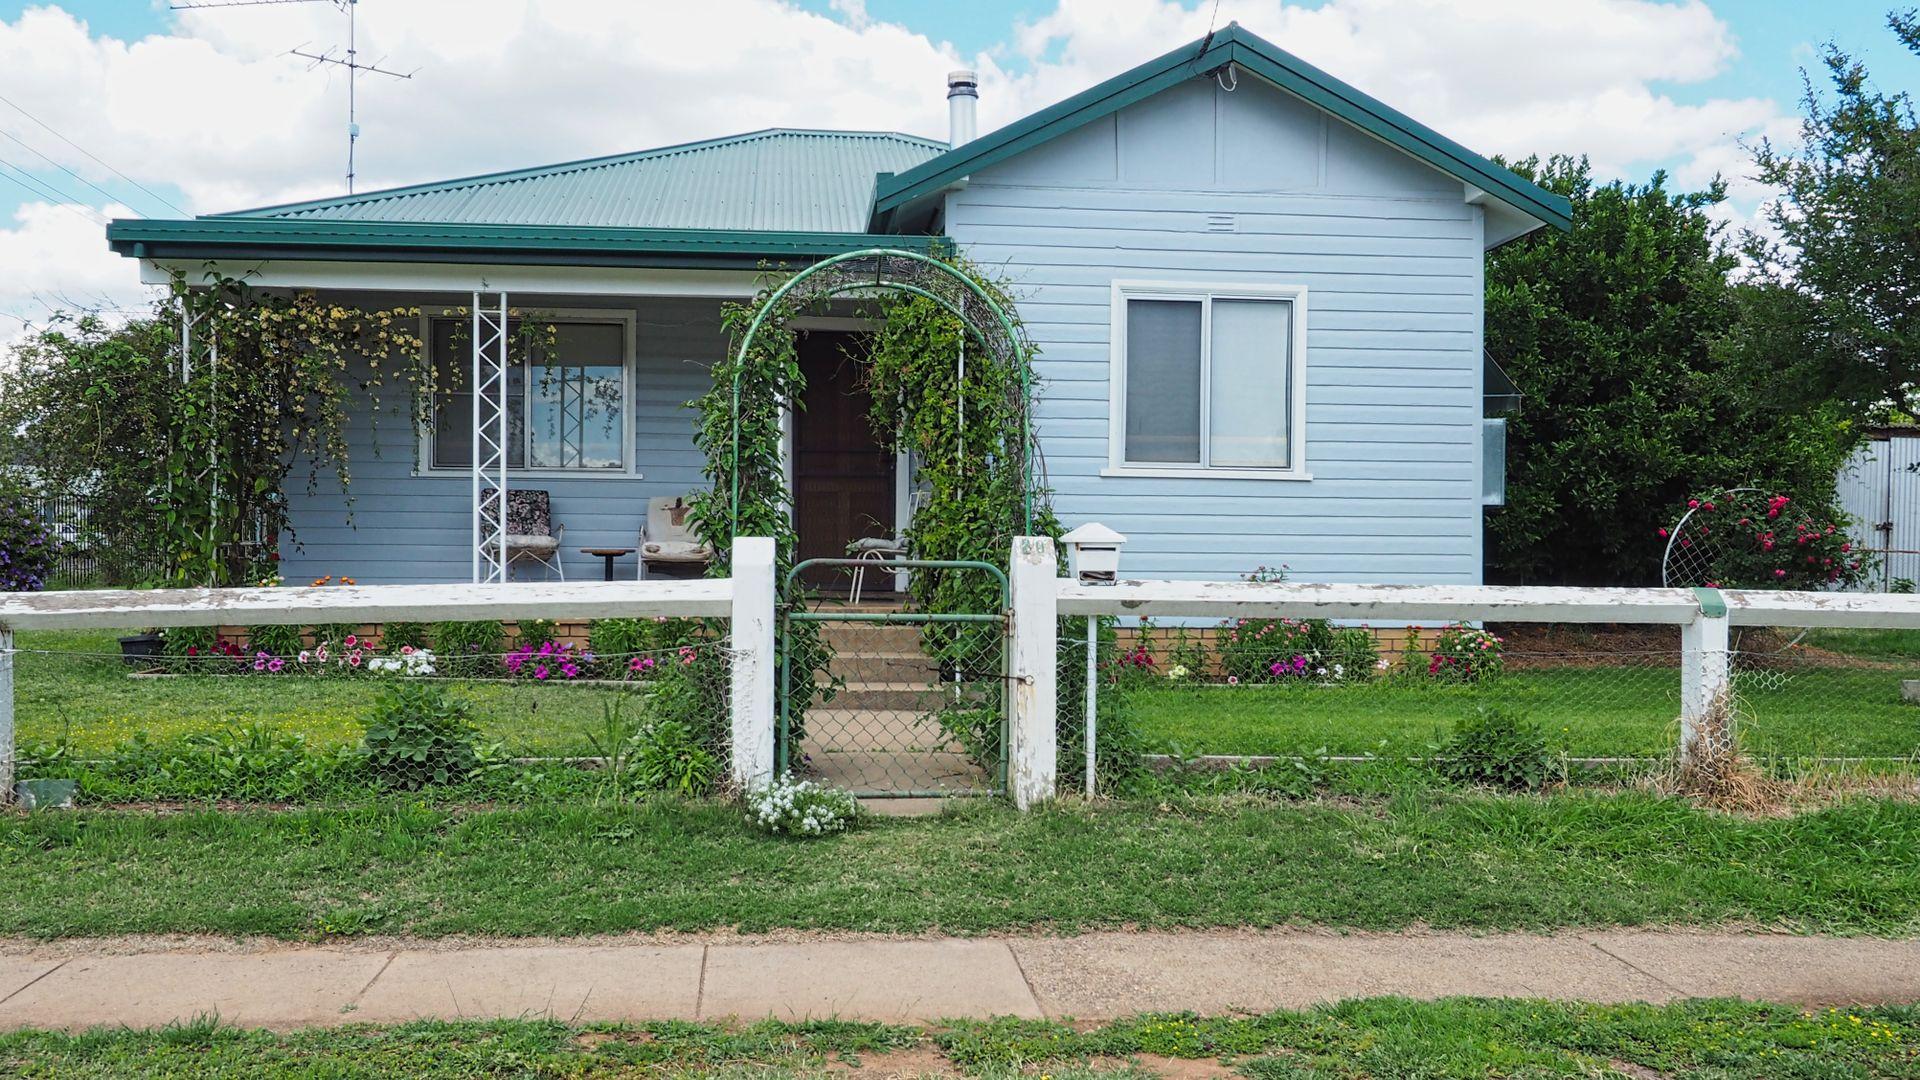 20 Finch Street, Bingara NSW 2404, Image 0